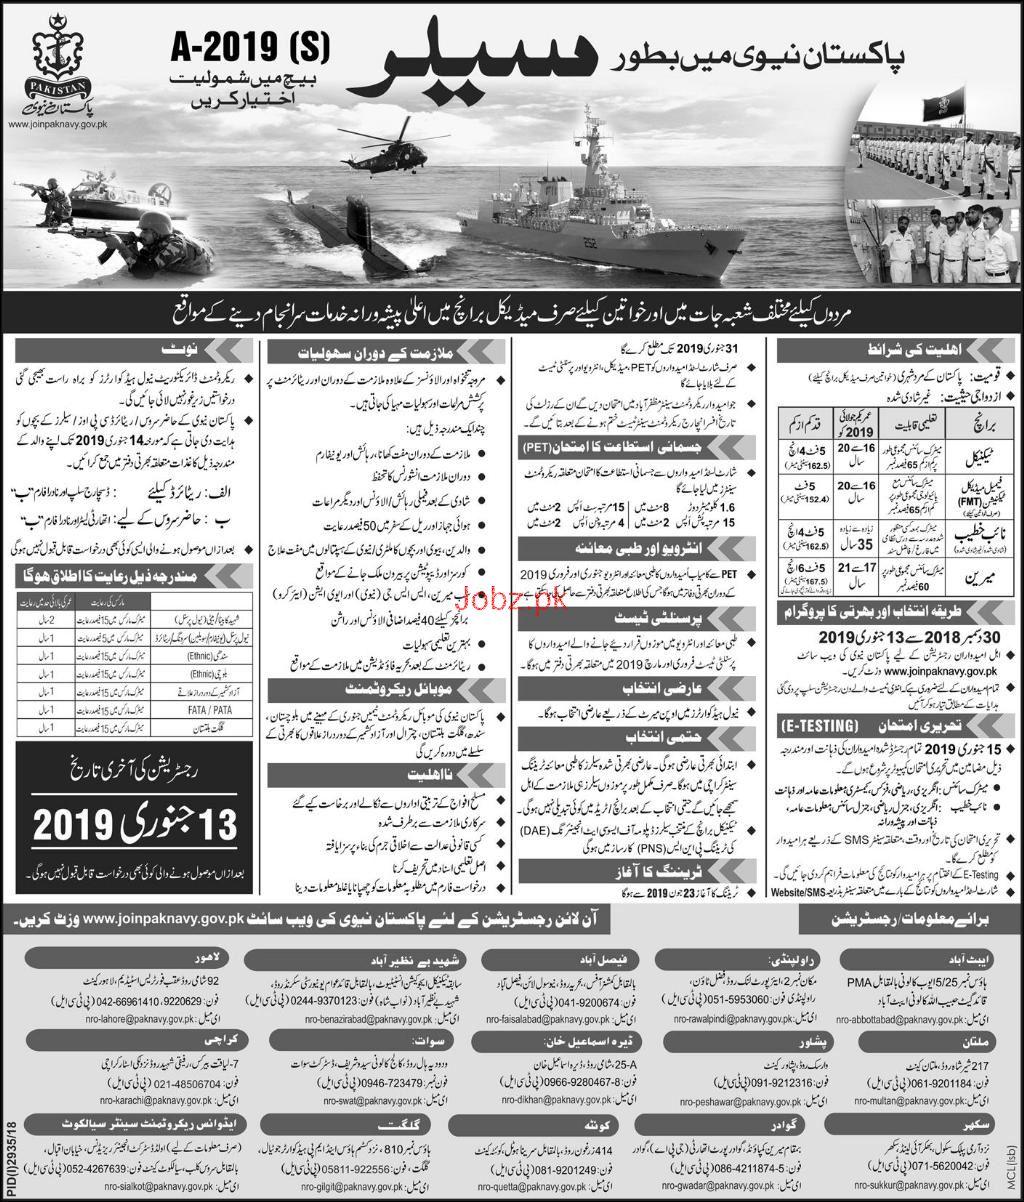 Recruitment as Sailor in Pakistan Navy